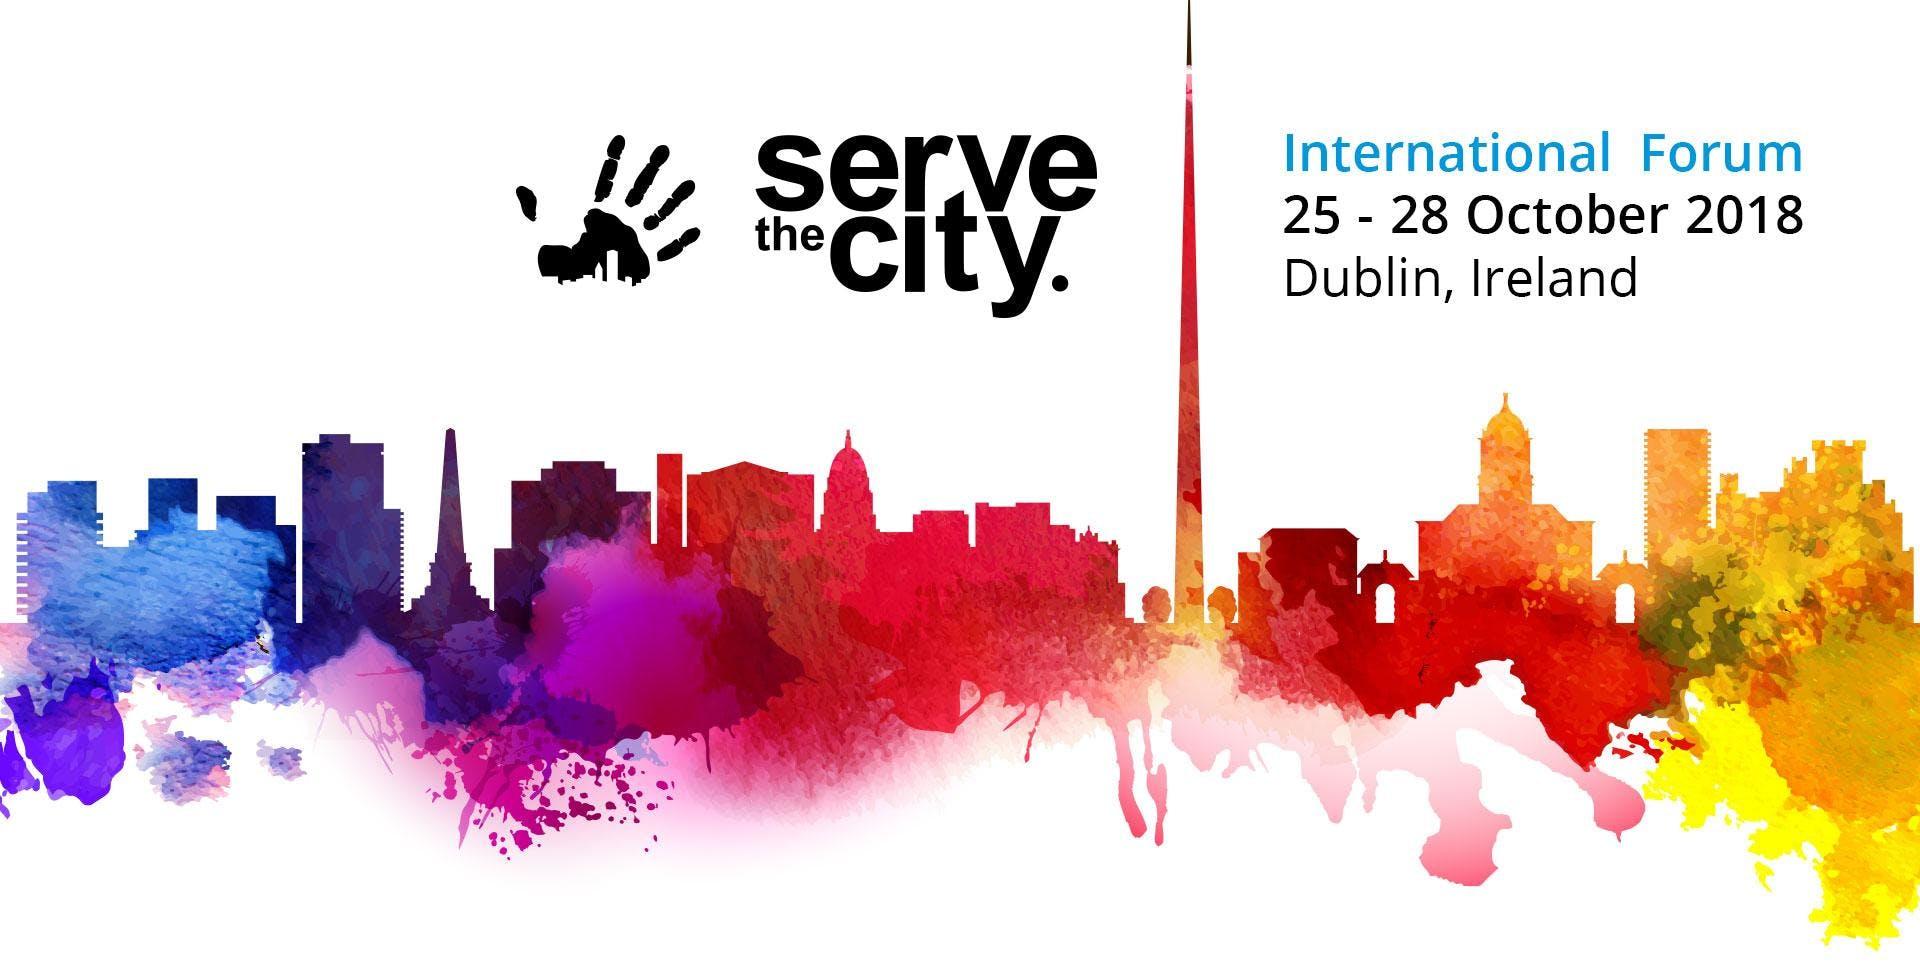 Serve the City International Forum